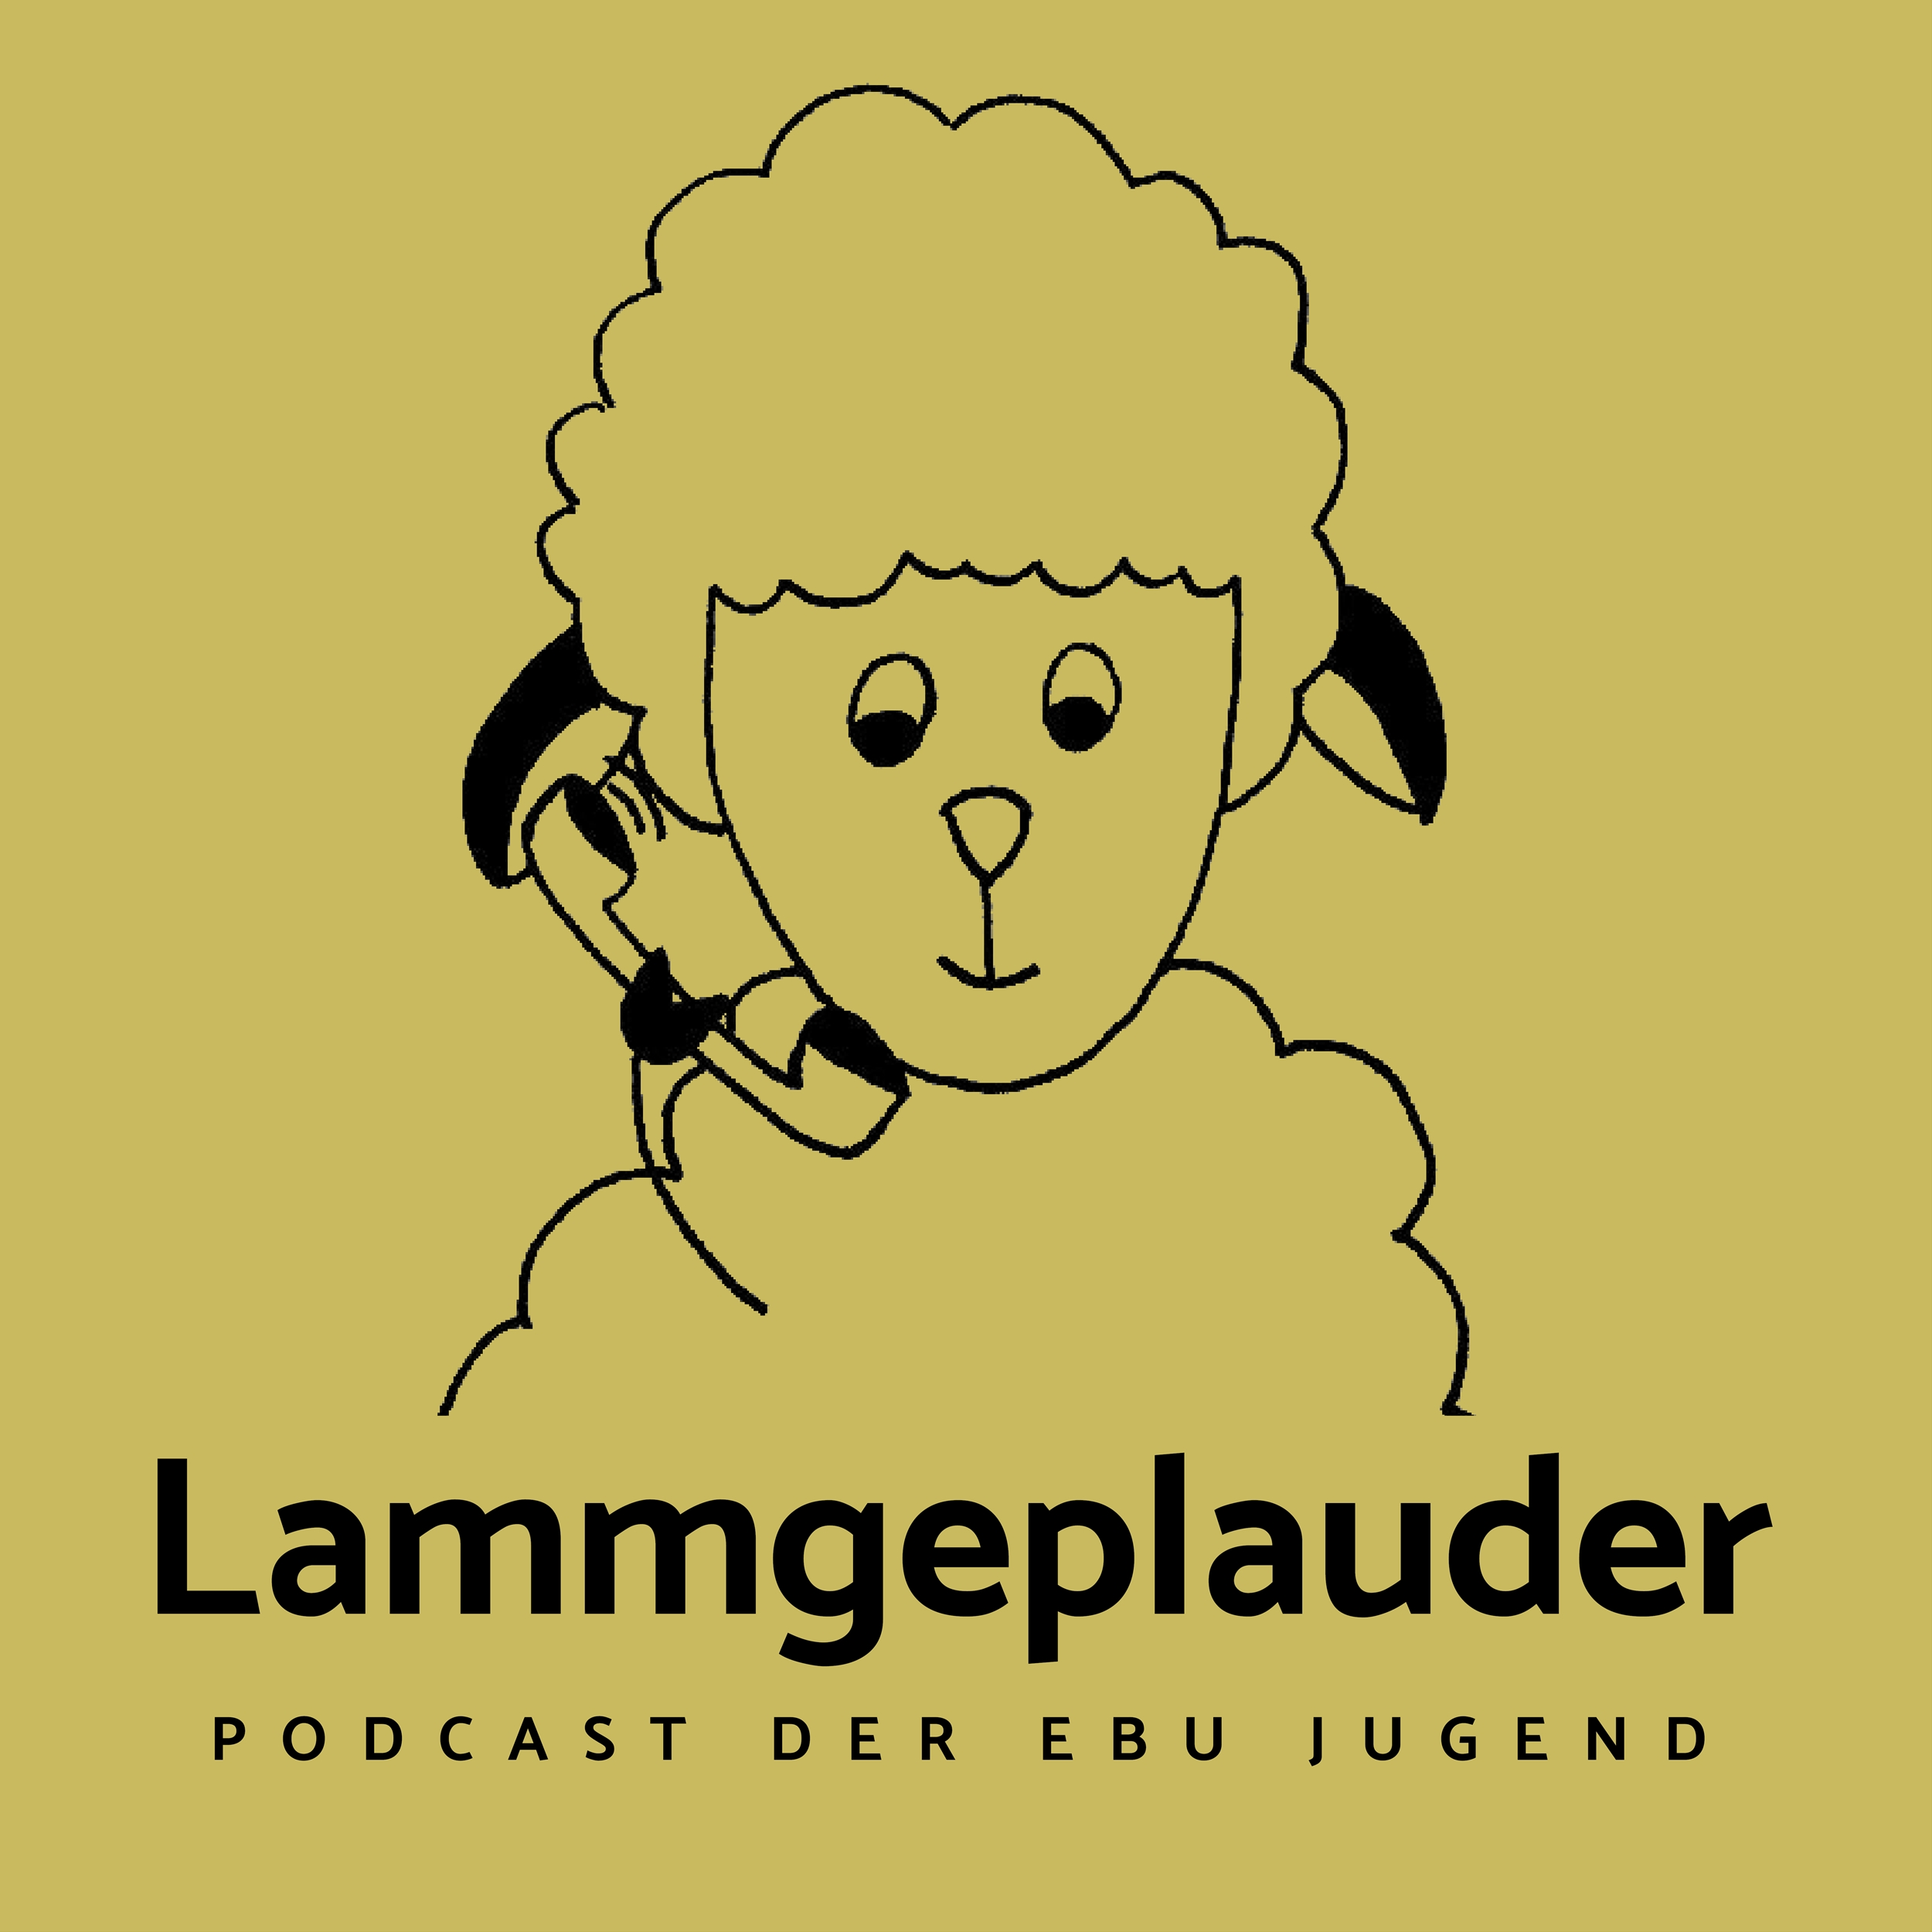 Lamm mit Telefonhörer. Lammgeplauder - Podcast der EBU Jugend